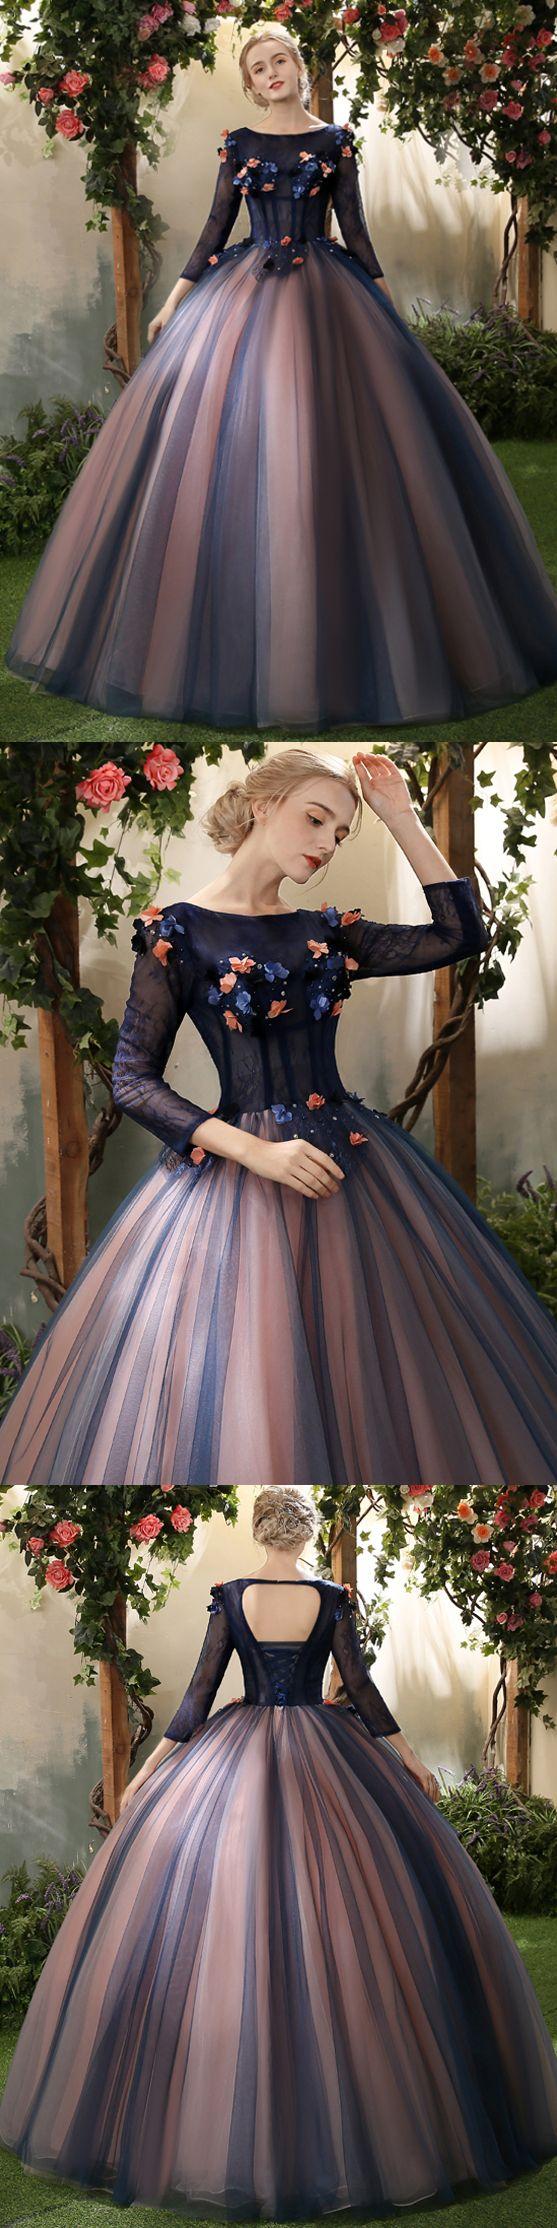 Ball gown prom dress bateau floorlength length lace prom dress